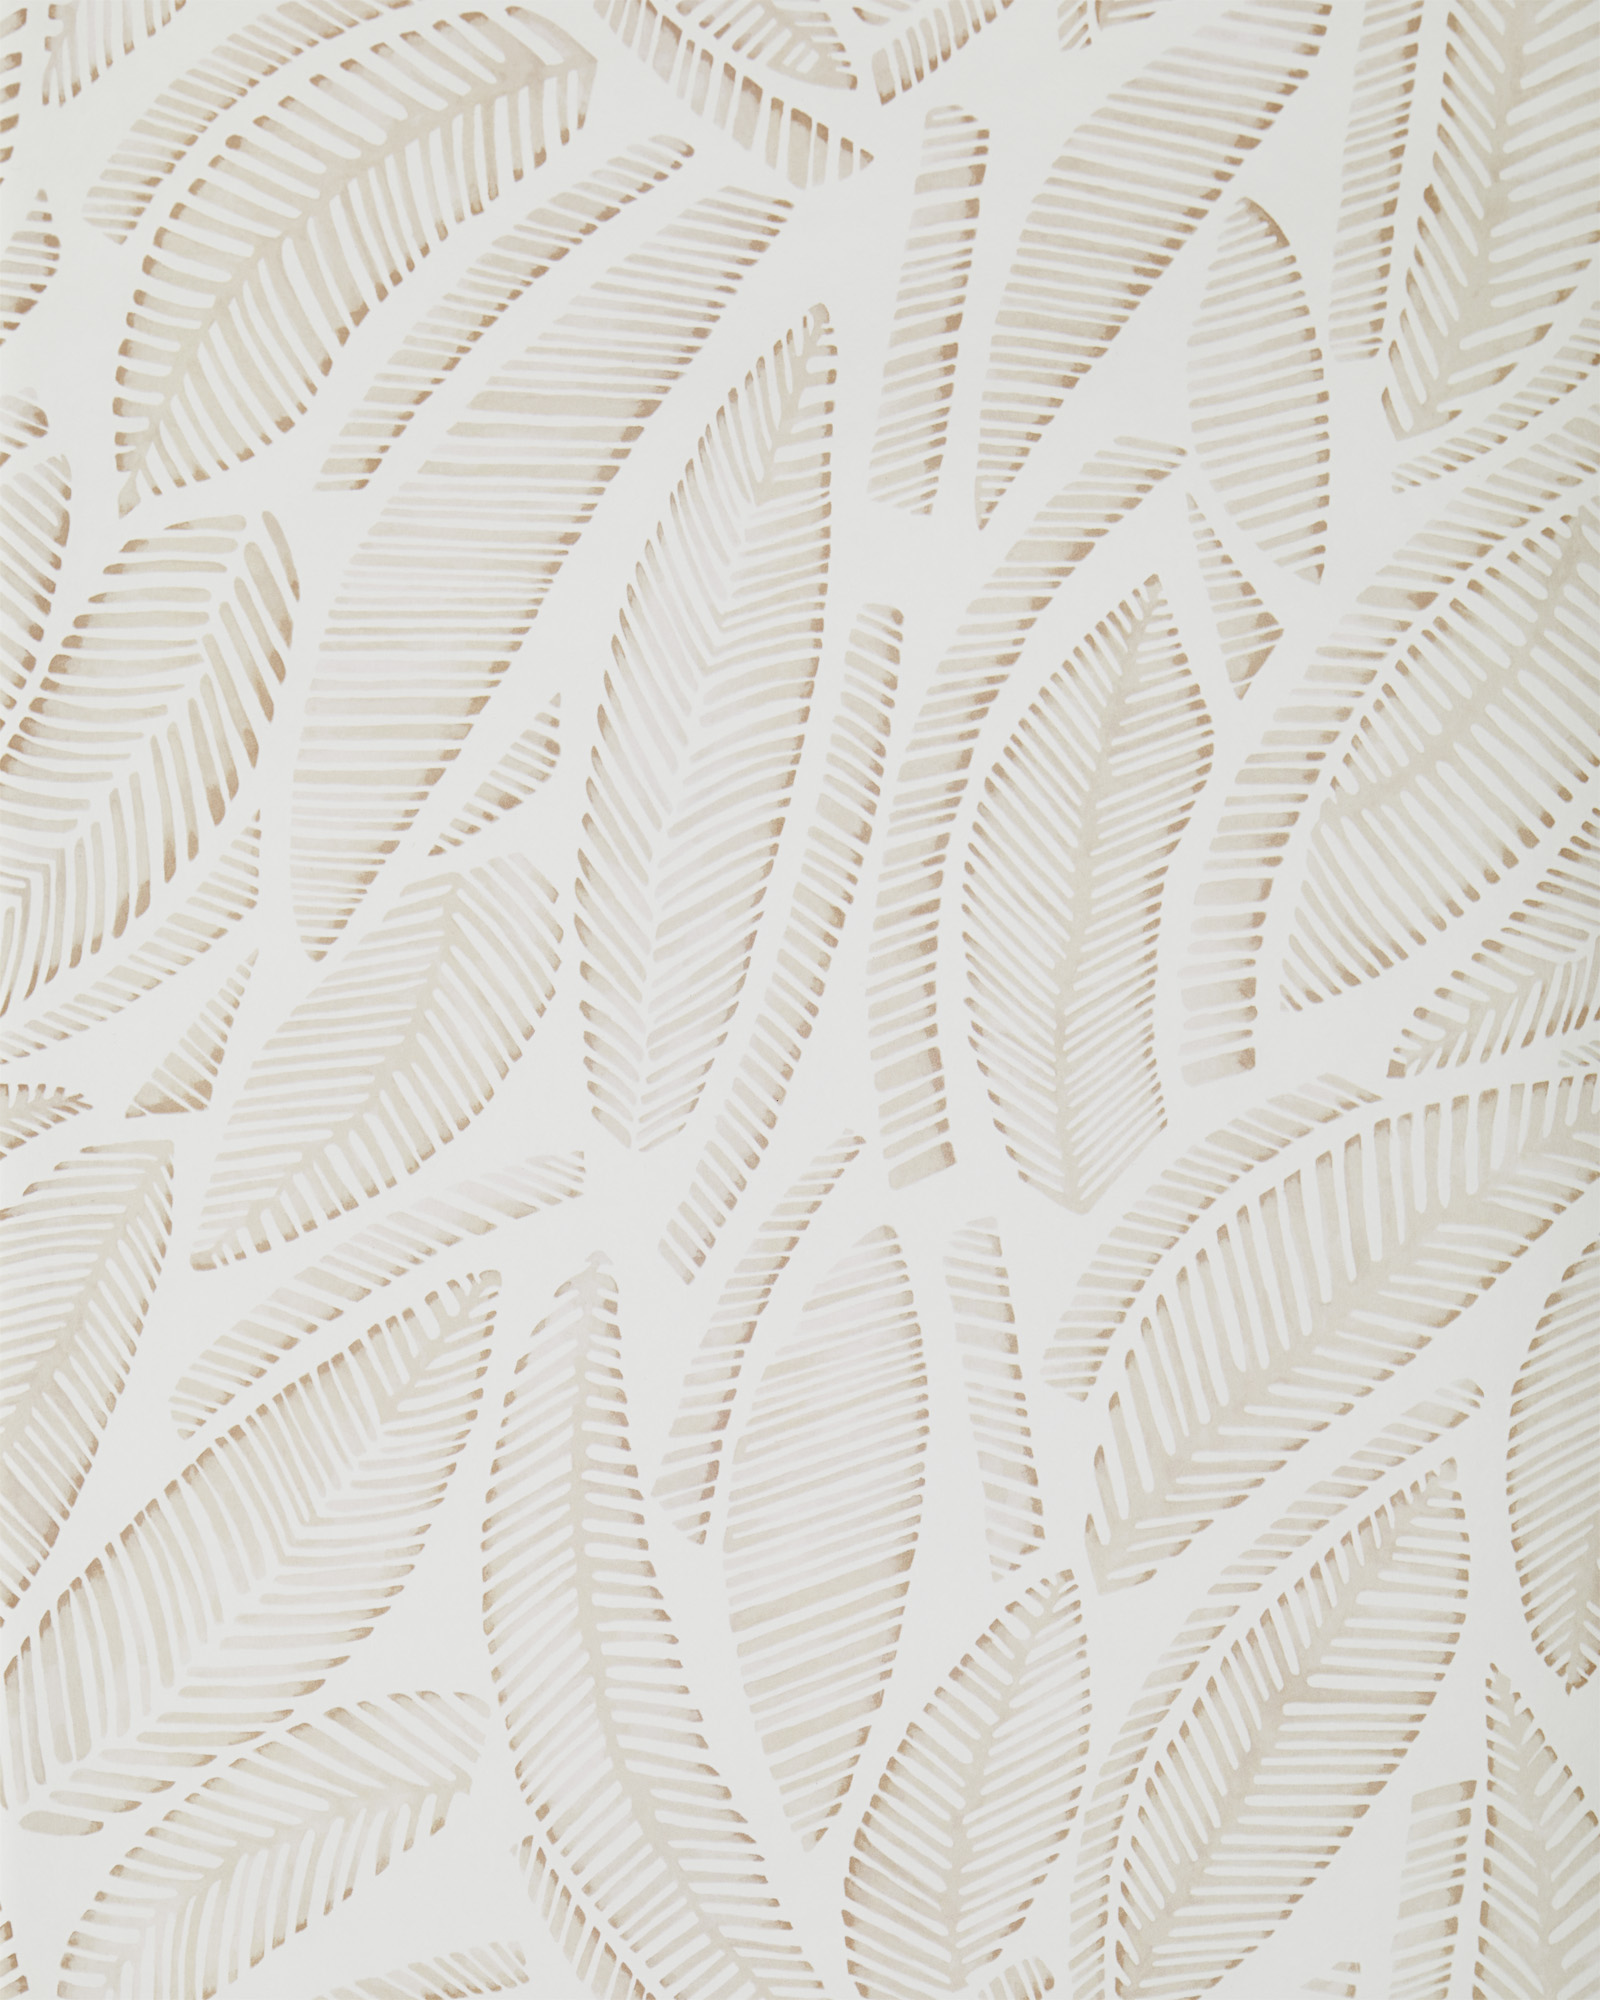 Wallpaper_Fallbrook_Sand_Full_MV_0452_Crop_BASE.jpg